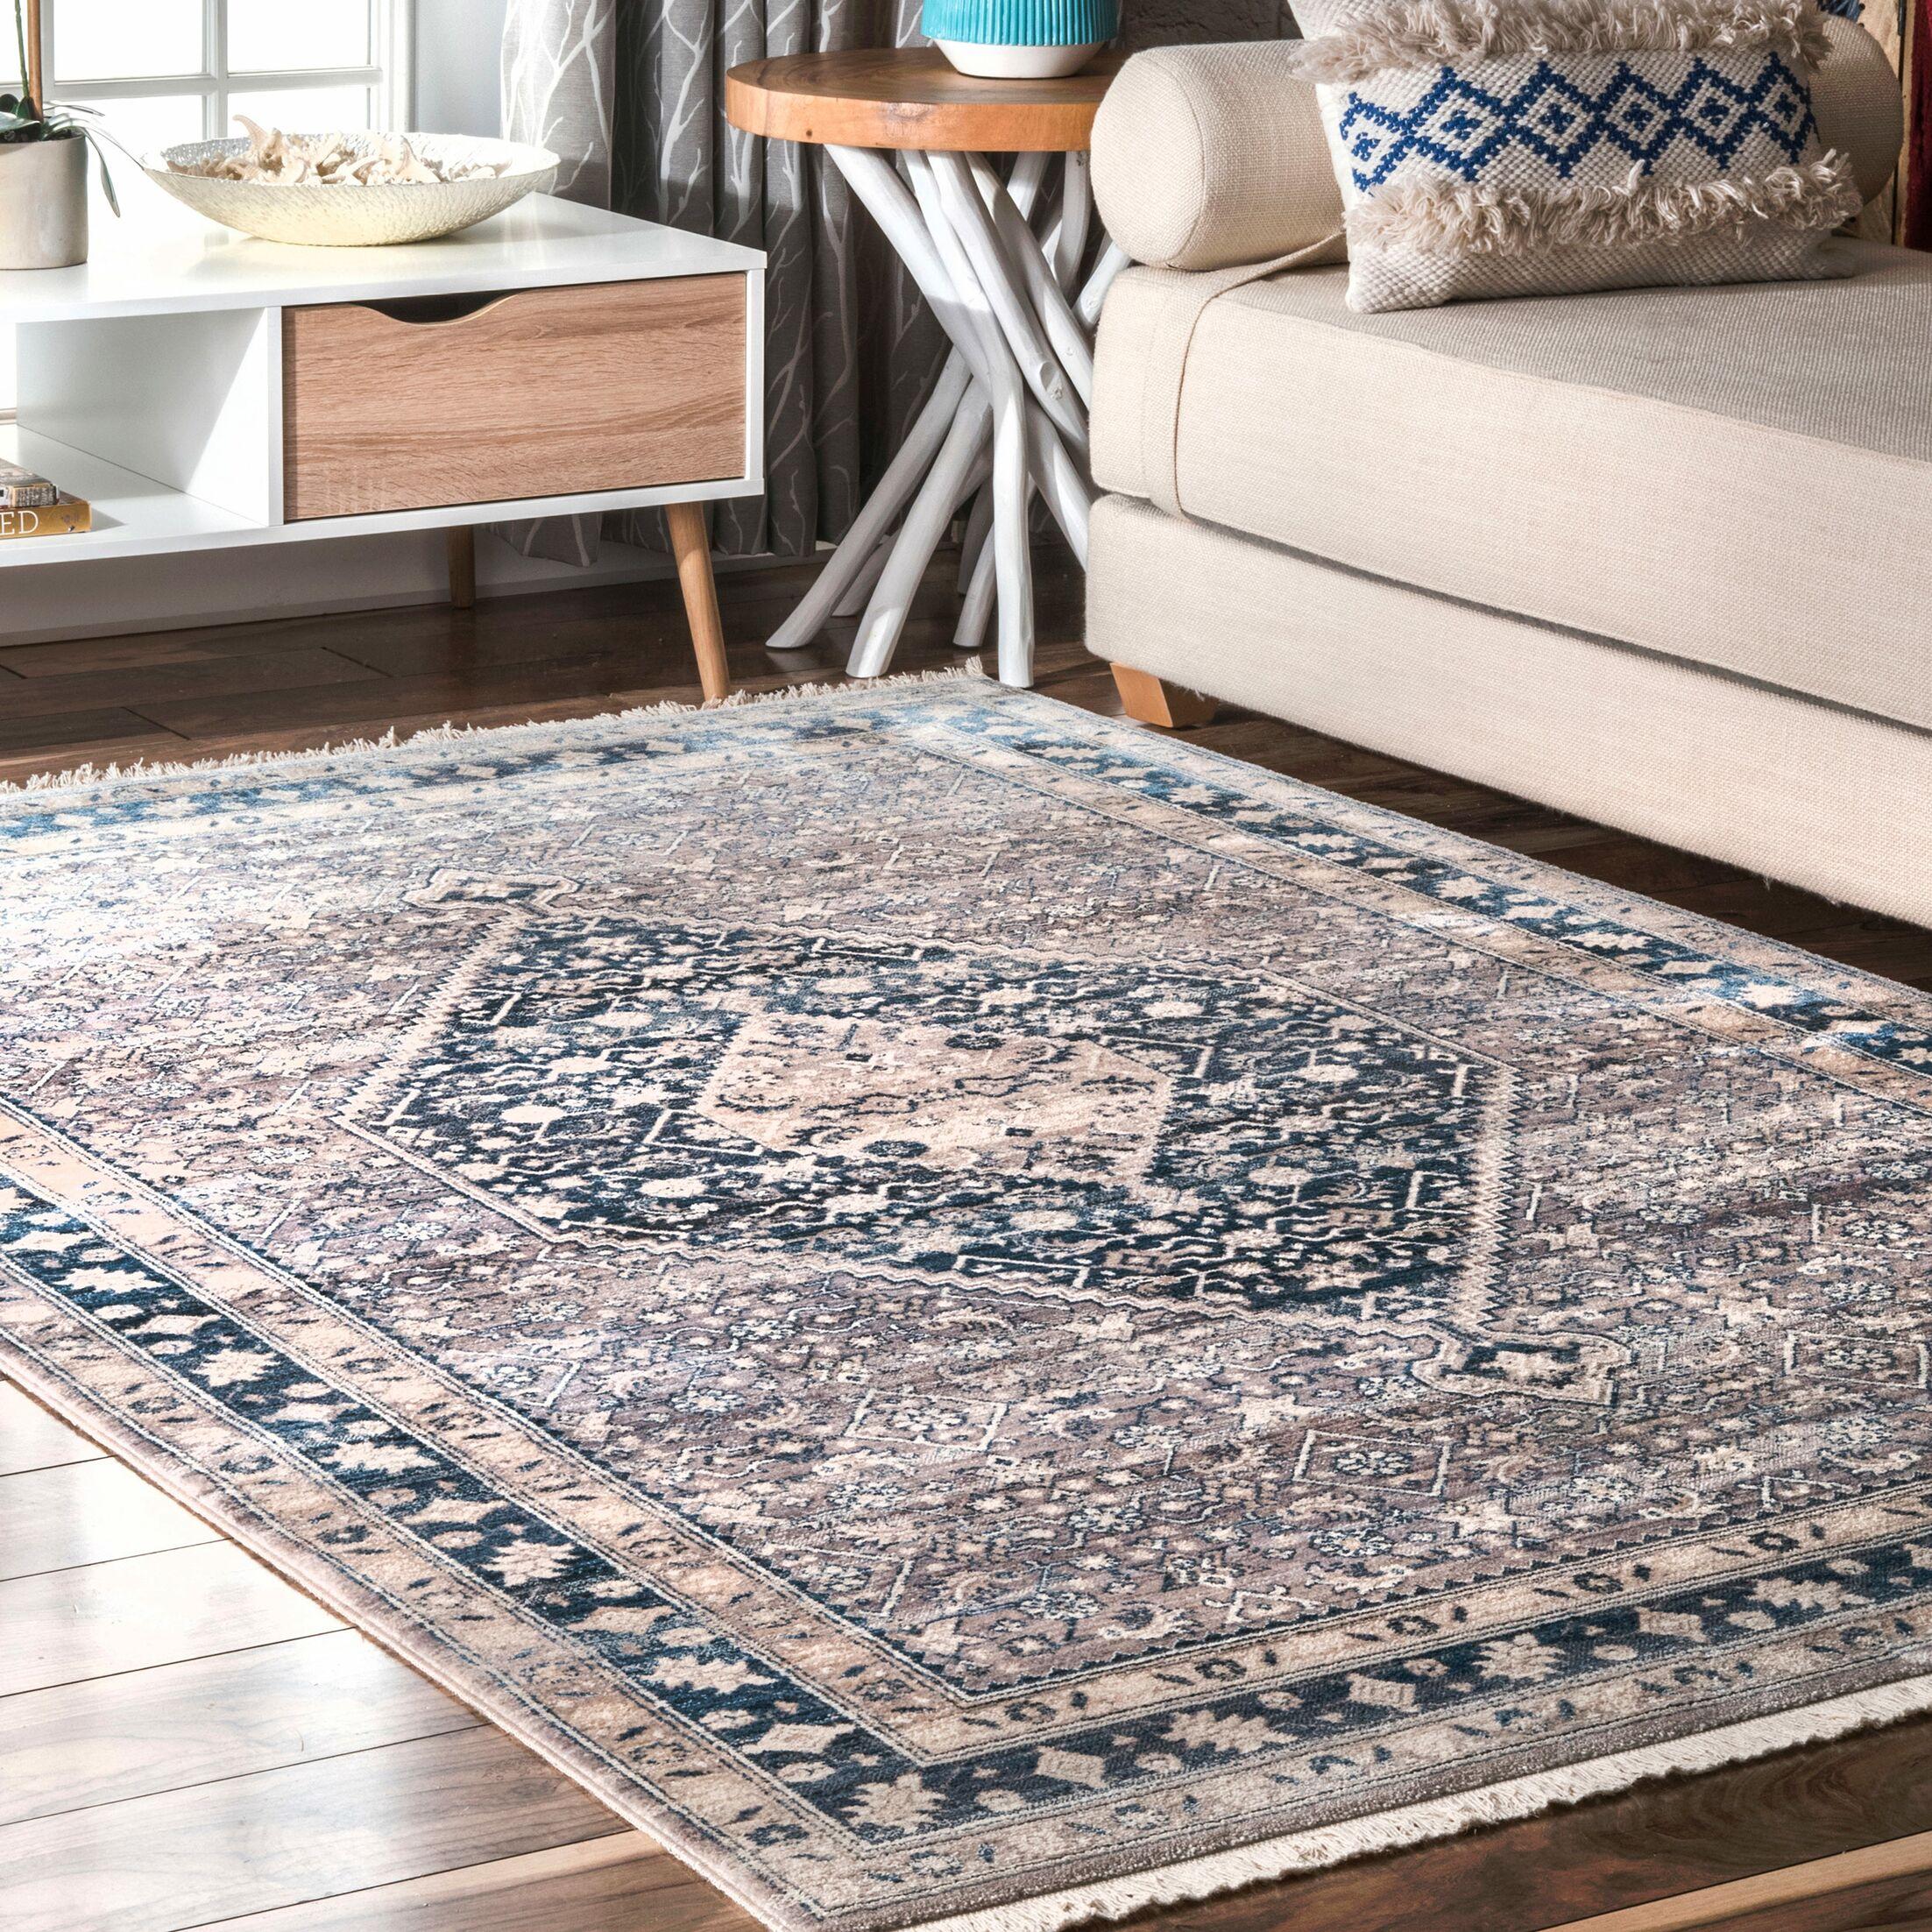 Georgetta Blue Area Rug Rug Size: Rectangle 8' x 10'